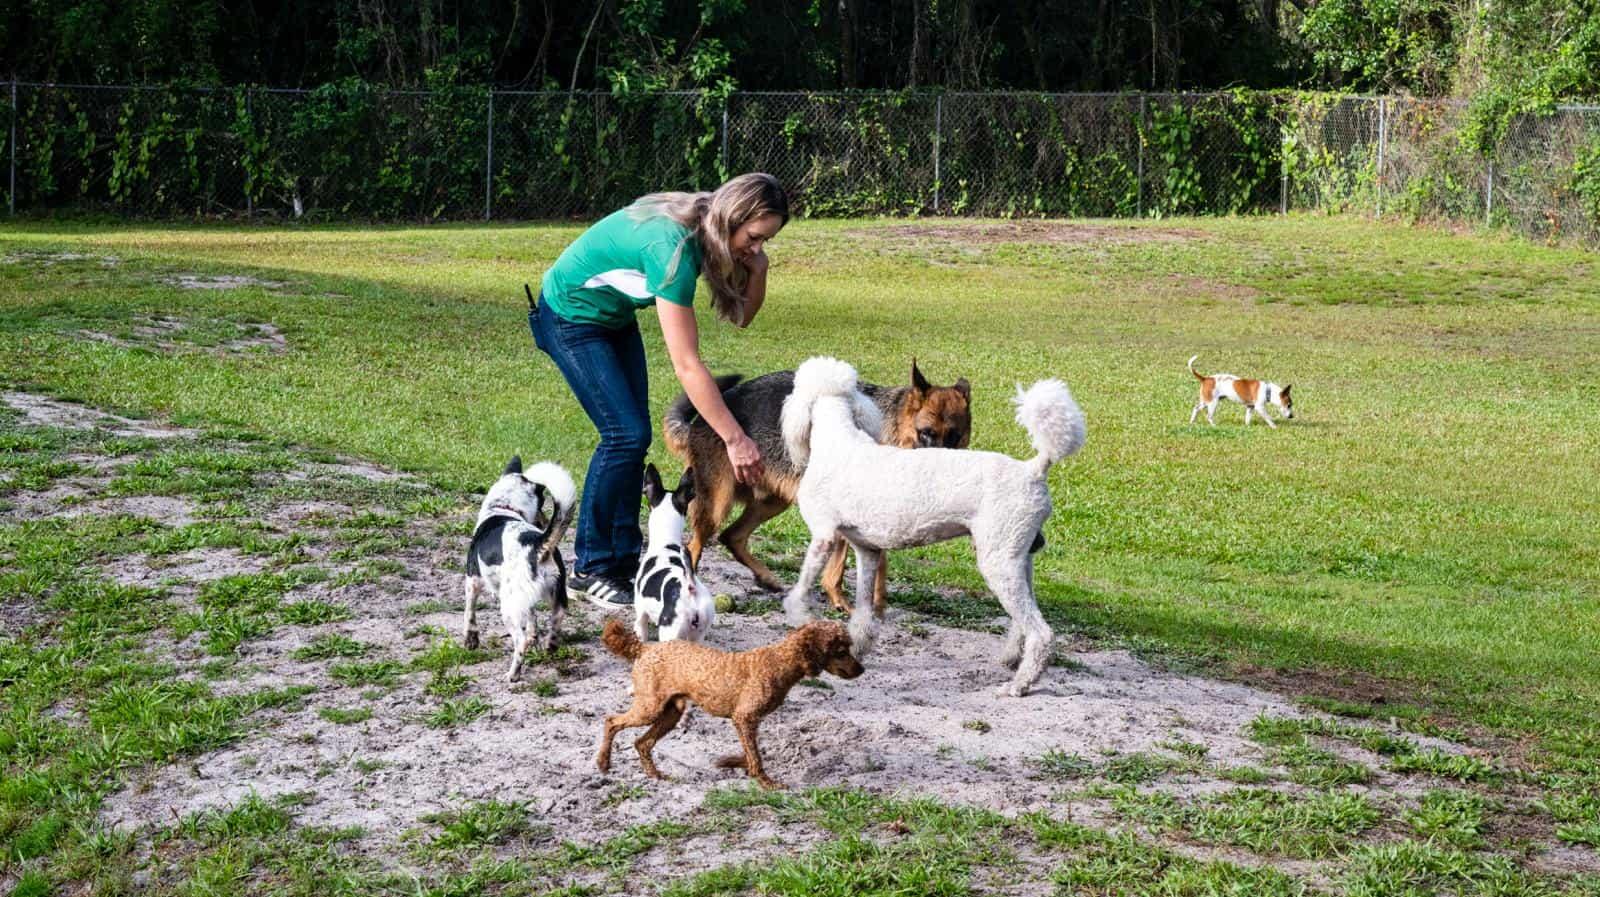 Doggie Daycare Overnight Dog Boarding & Pet Grooming Bradenton FL Image Carousel 2